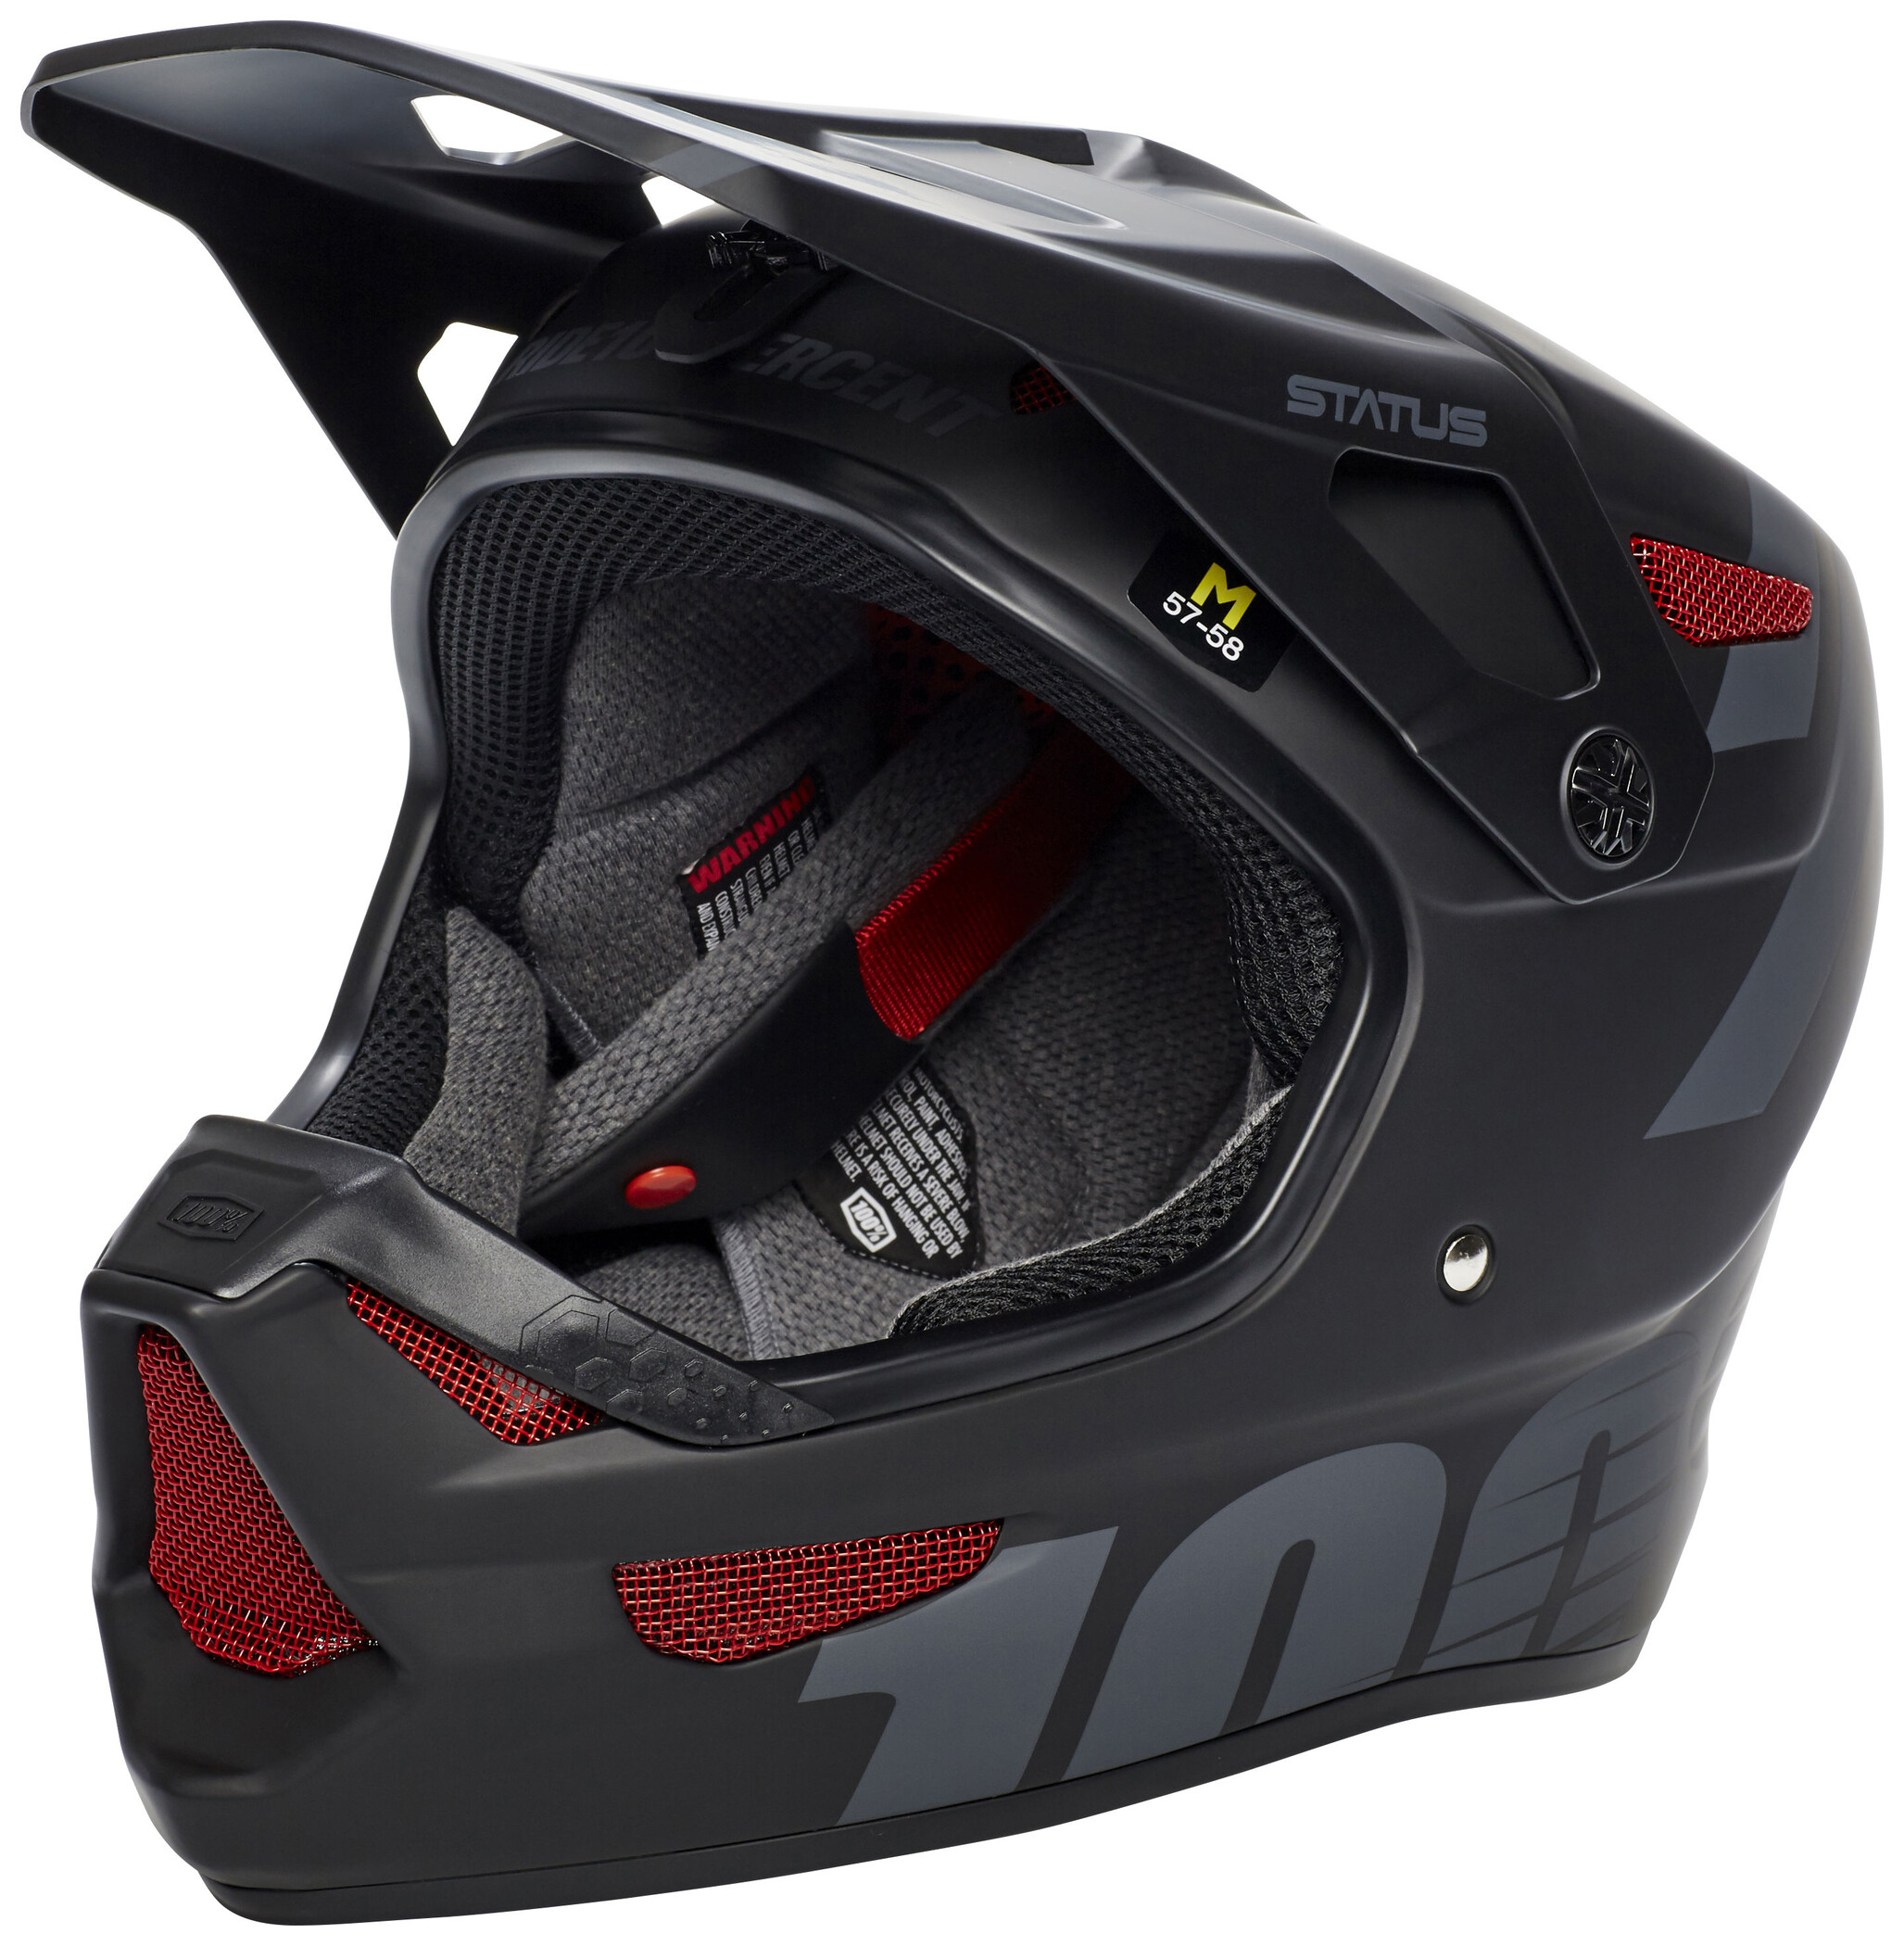 100% Status DH/BMX Cykelhjelm, black meteor (2019) | Helmets